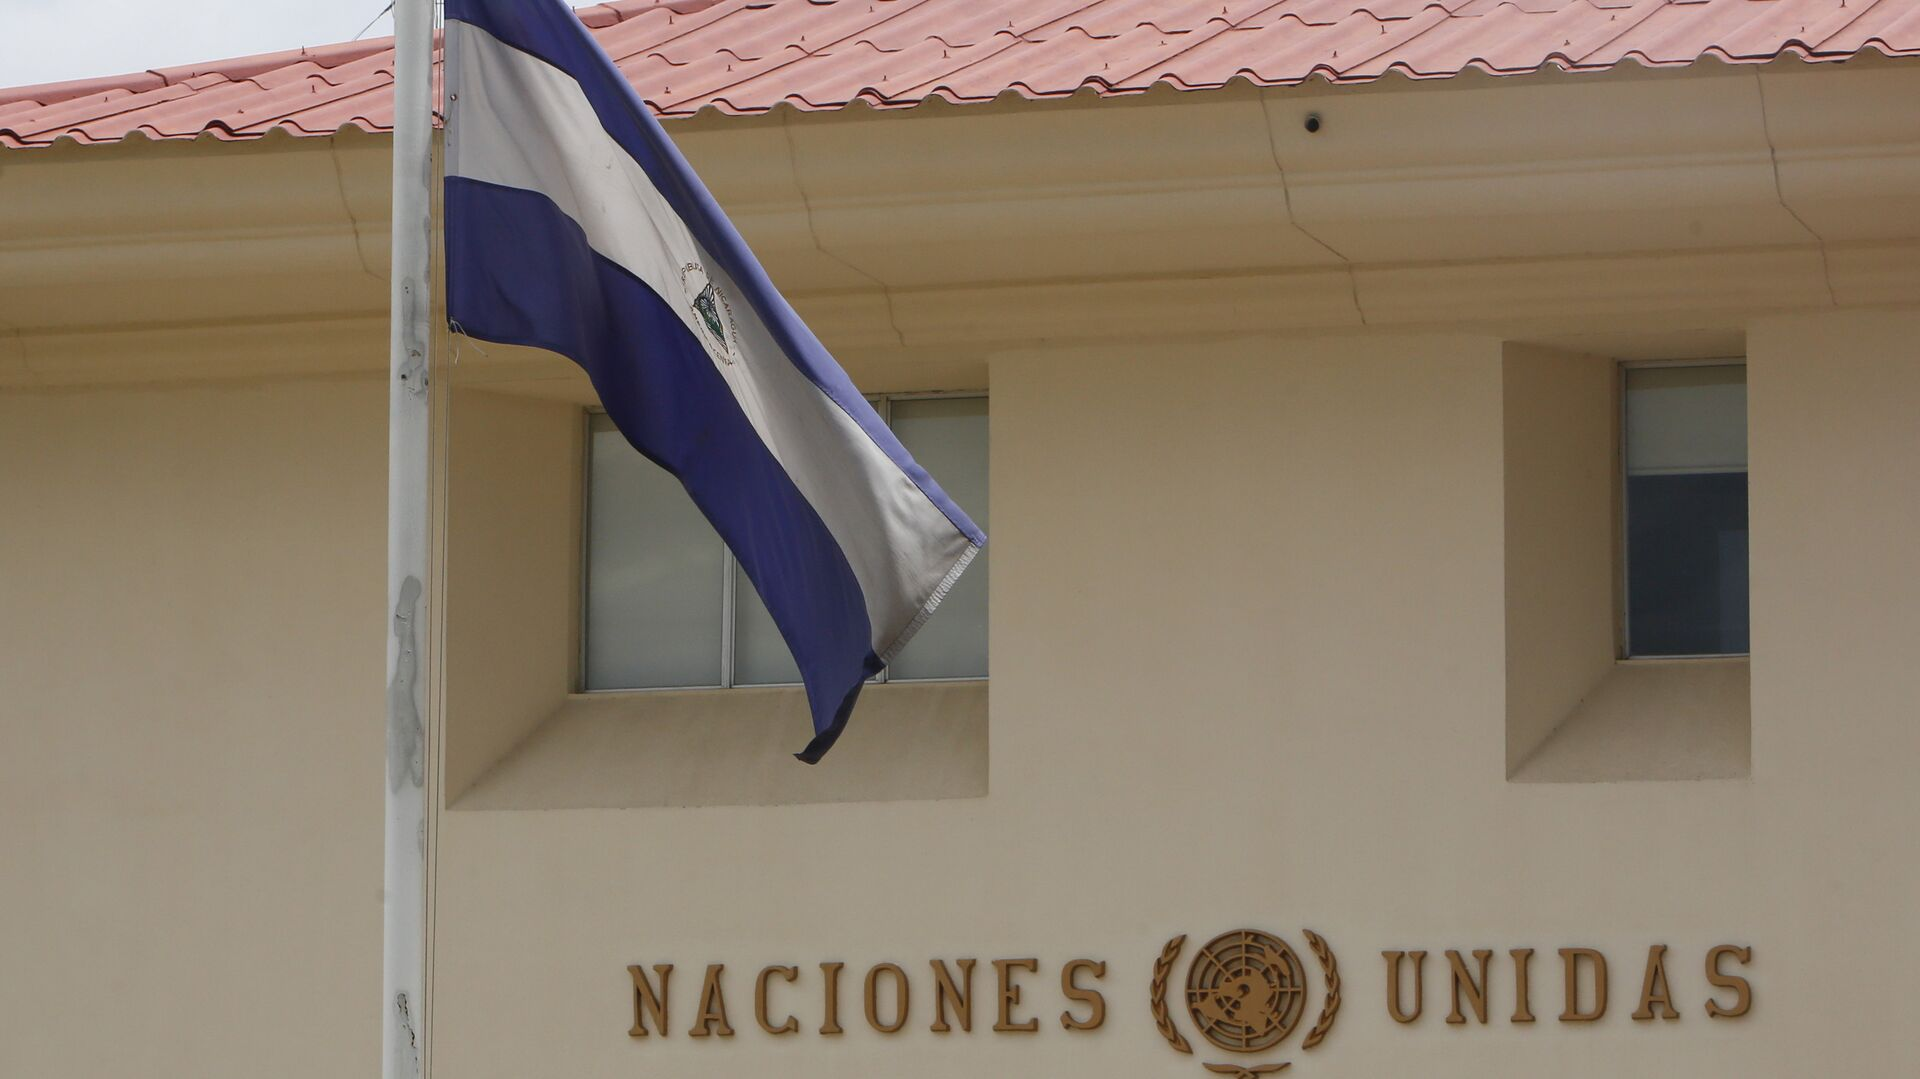 Bandera de Nicaragua - Sputnik Mundo, 1920, 22.06.2021